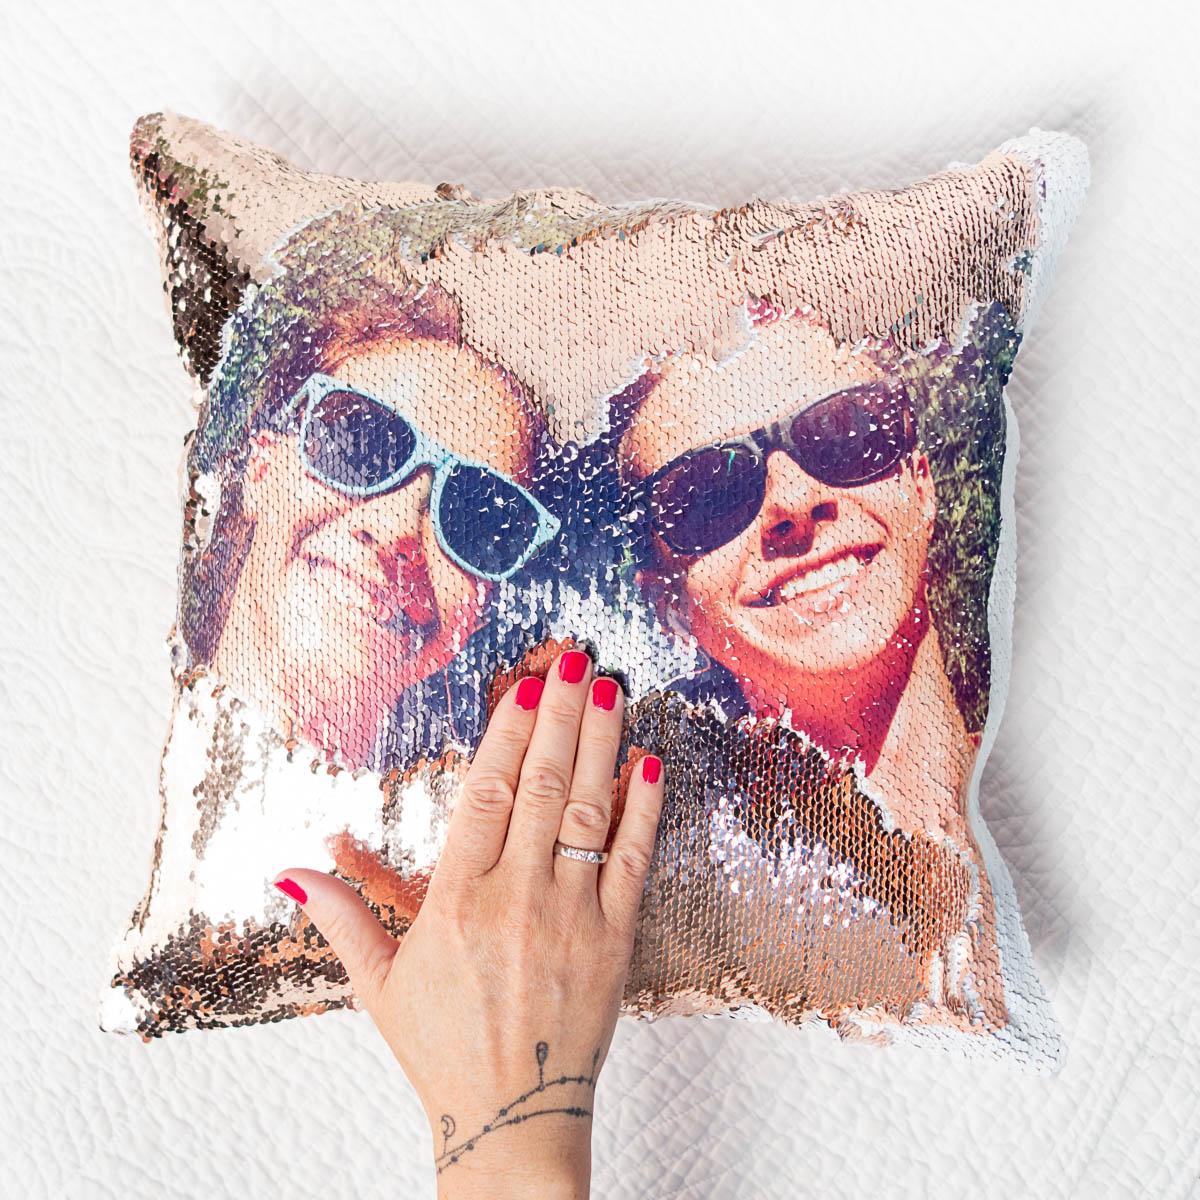 cadeau_voor_haar_personaliseerbaar_glitter_kussensloop